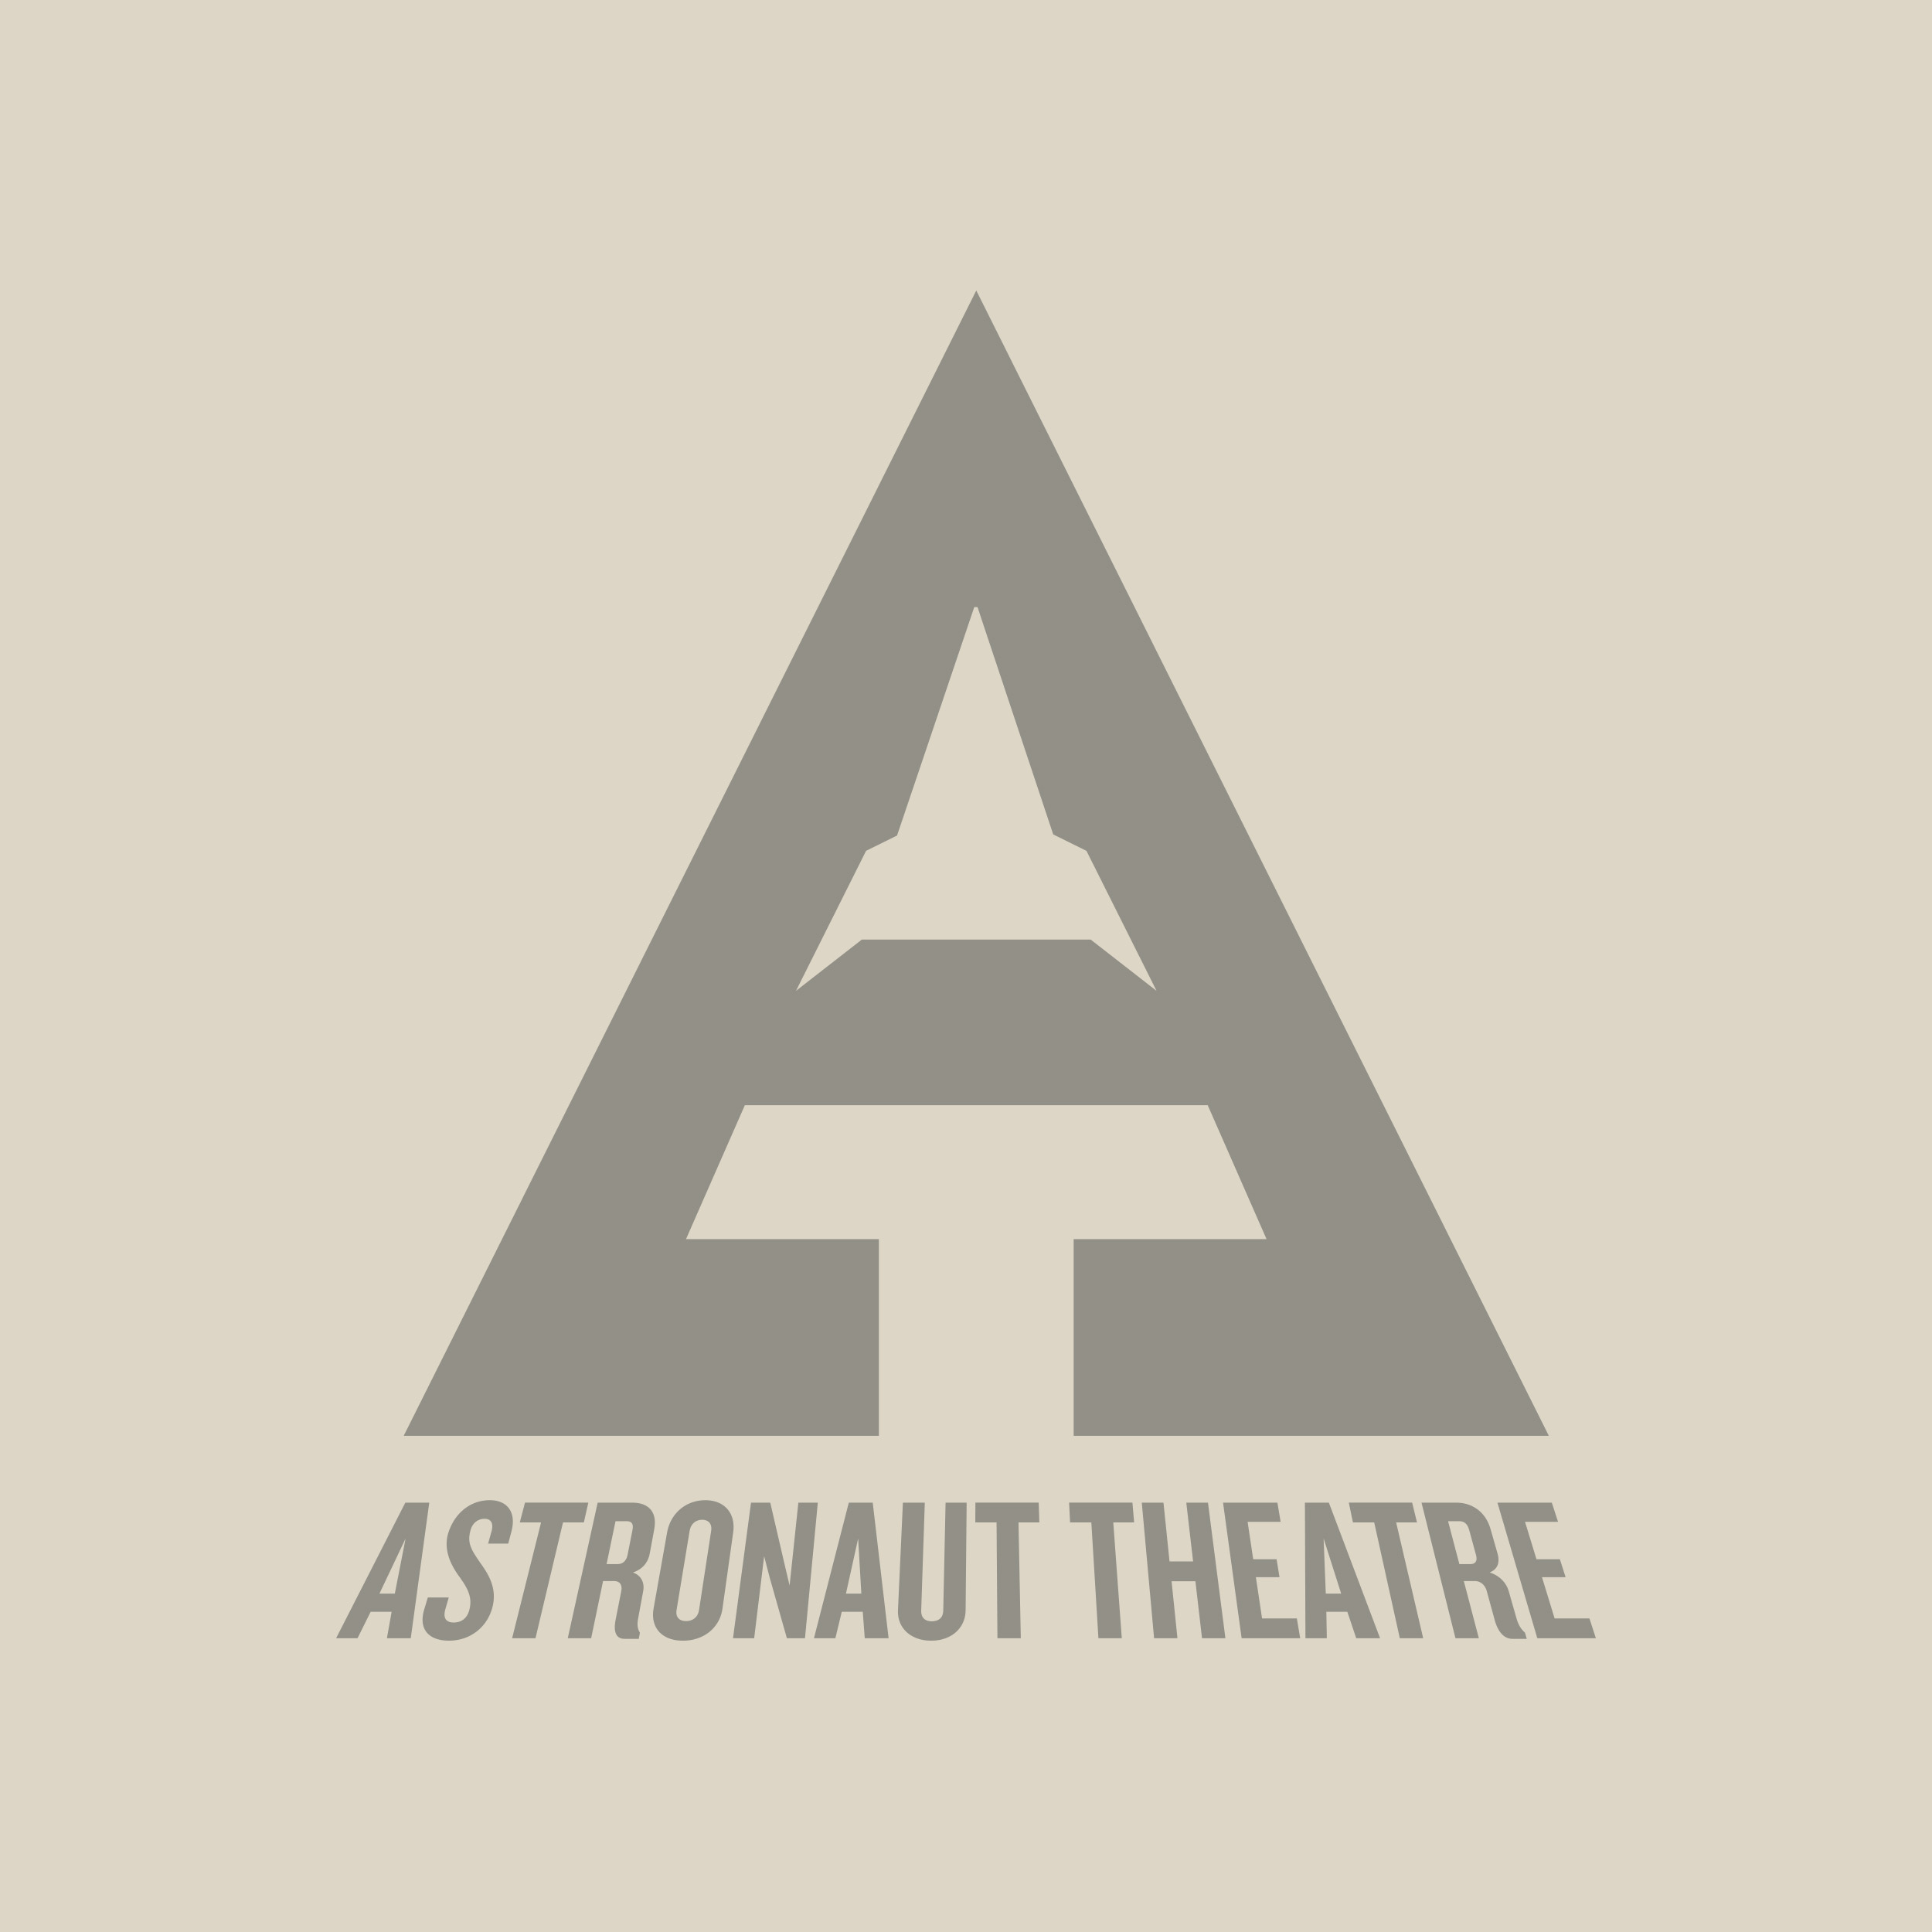 logos_0000_astro_theatre.jpg